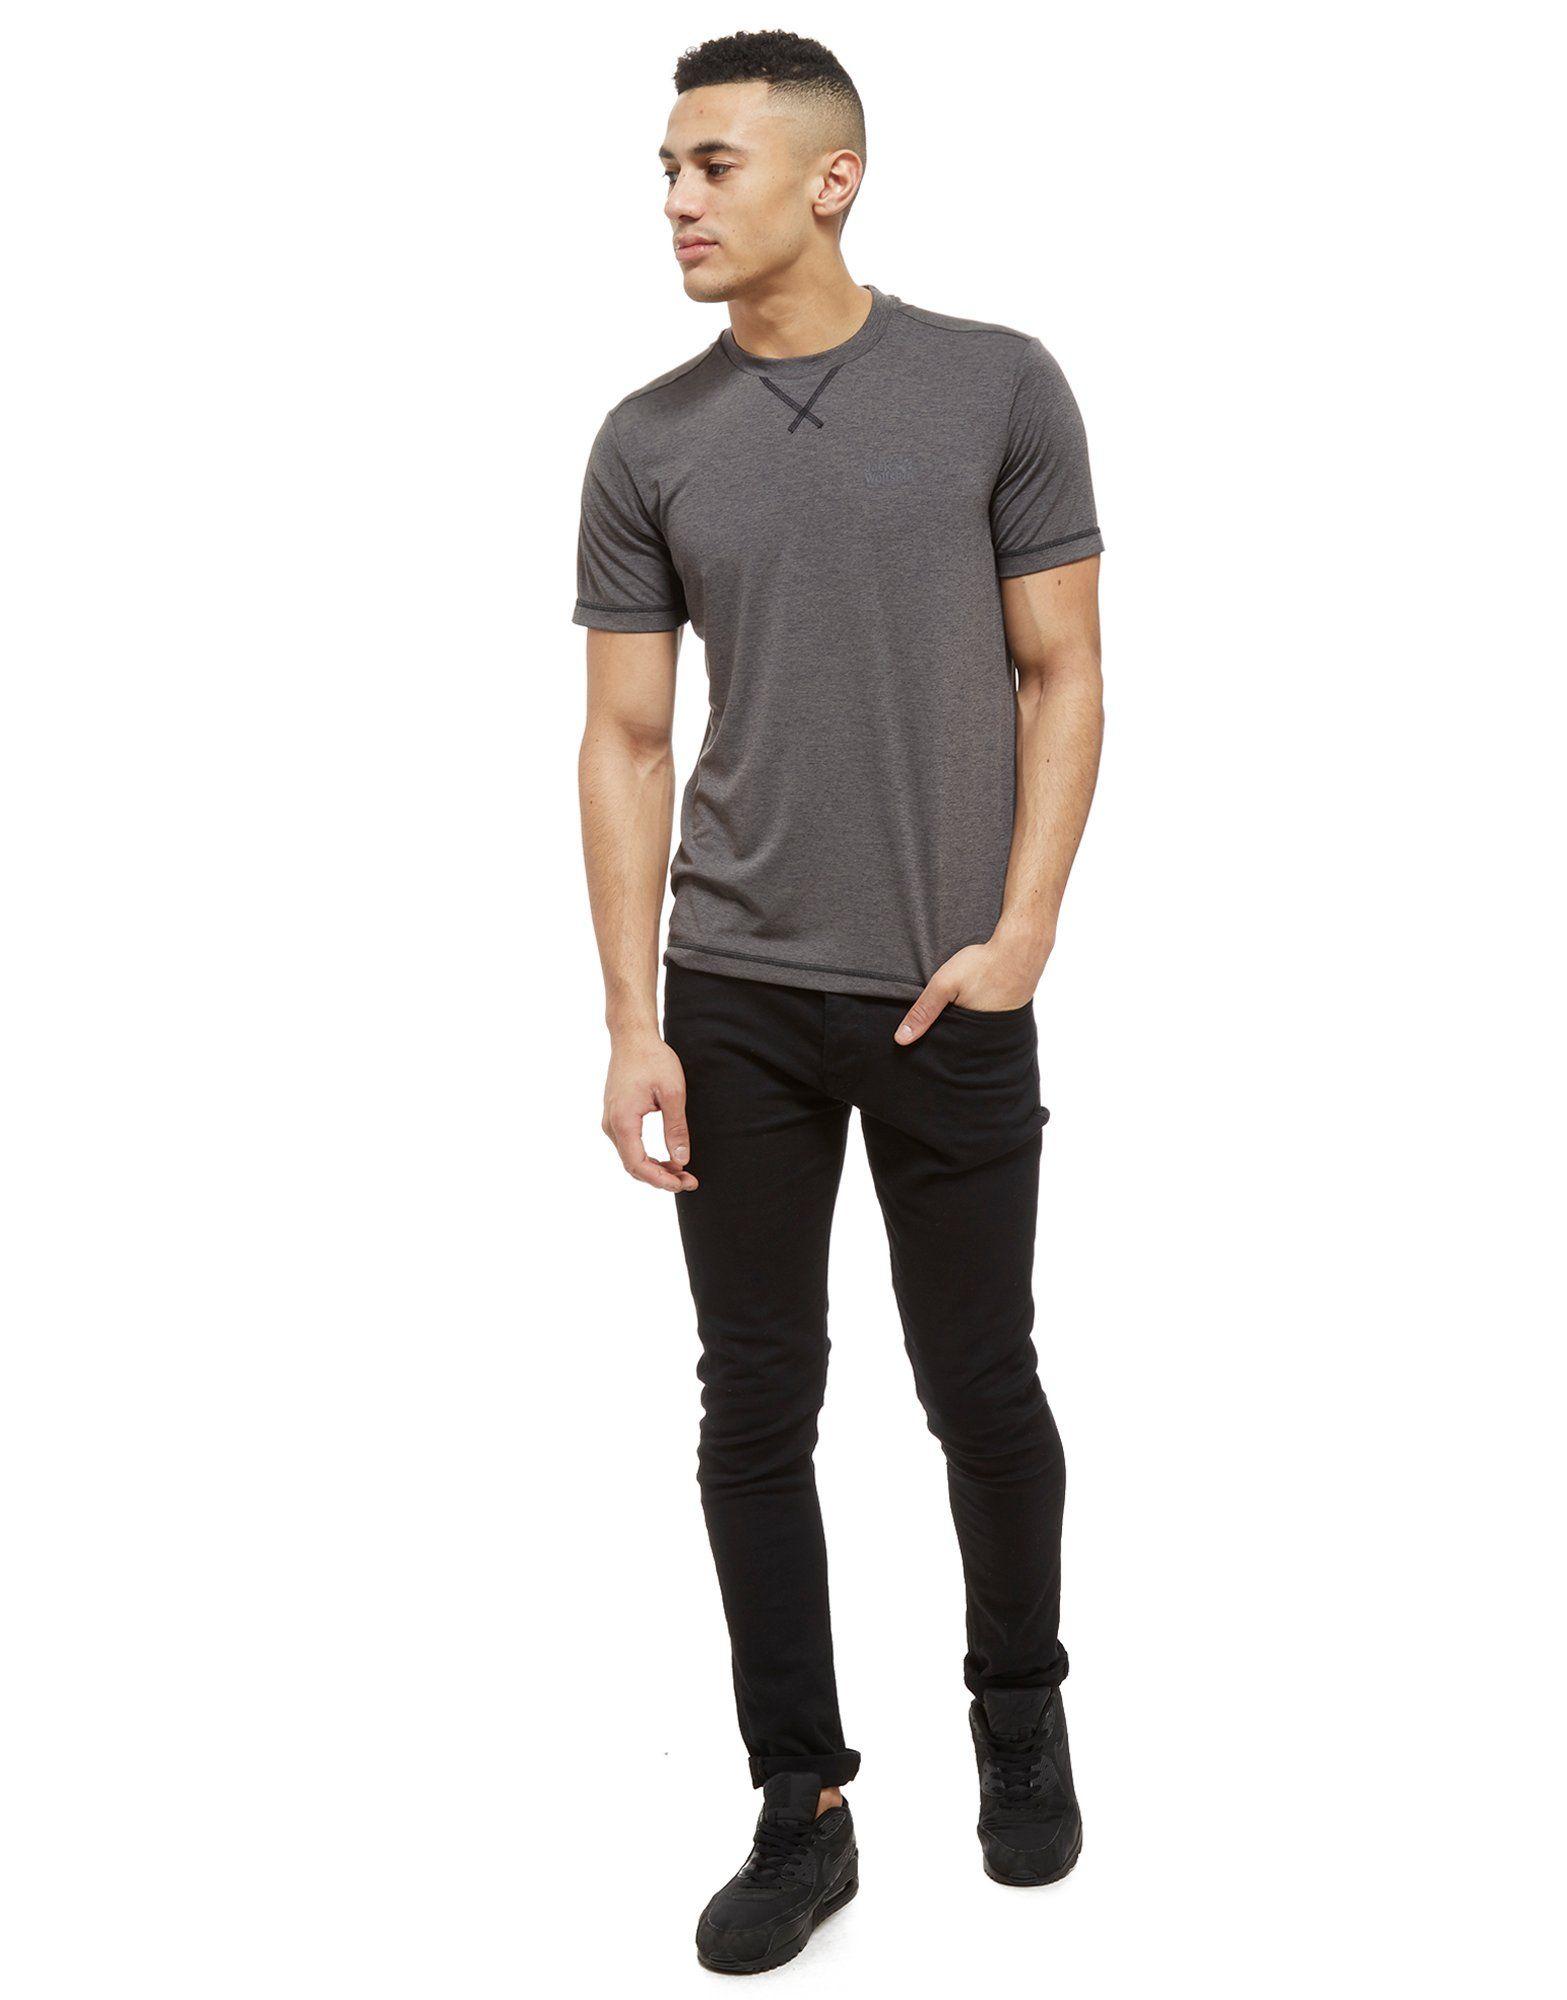 Jack Wolfskin Kurzarm Core Tech T-Shirt Grau